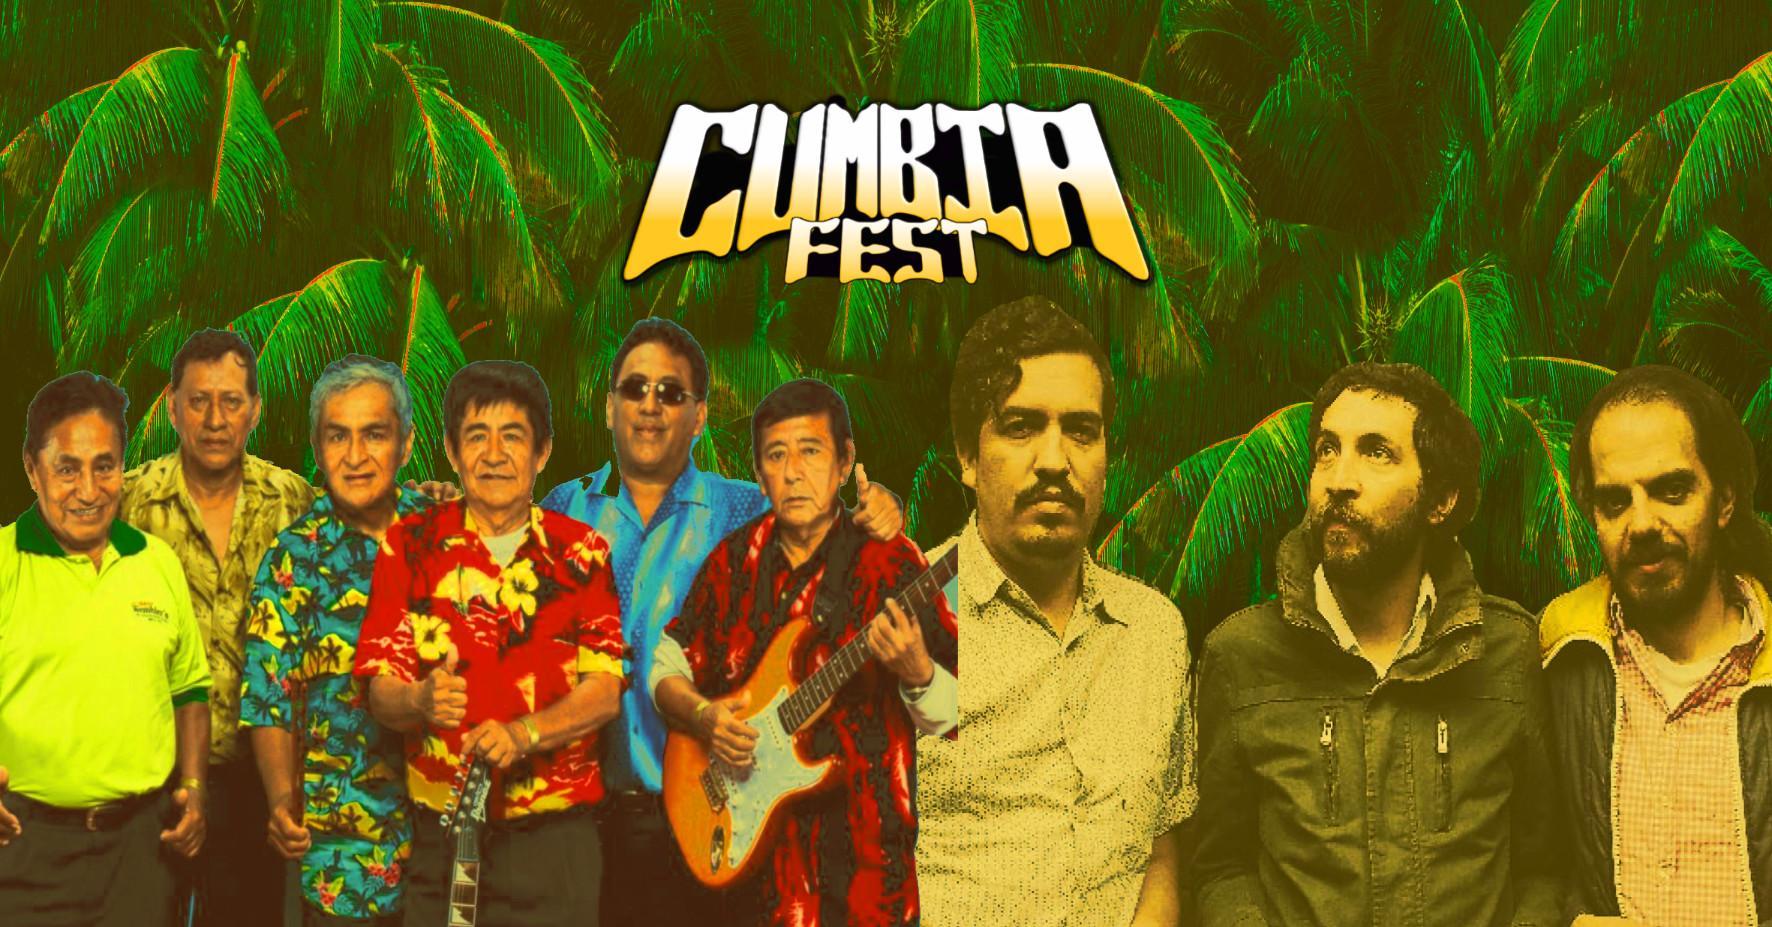 Cumbia Fest w/ Los Wemblers (Peru) & Los Pirañas (Mexico) live!